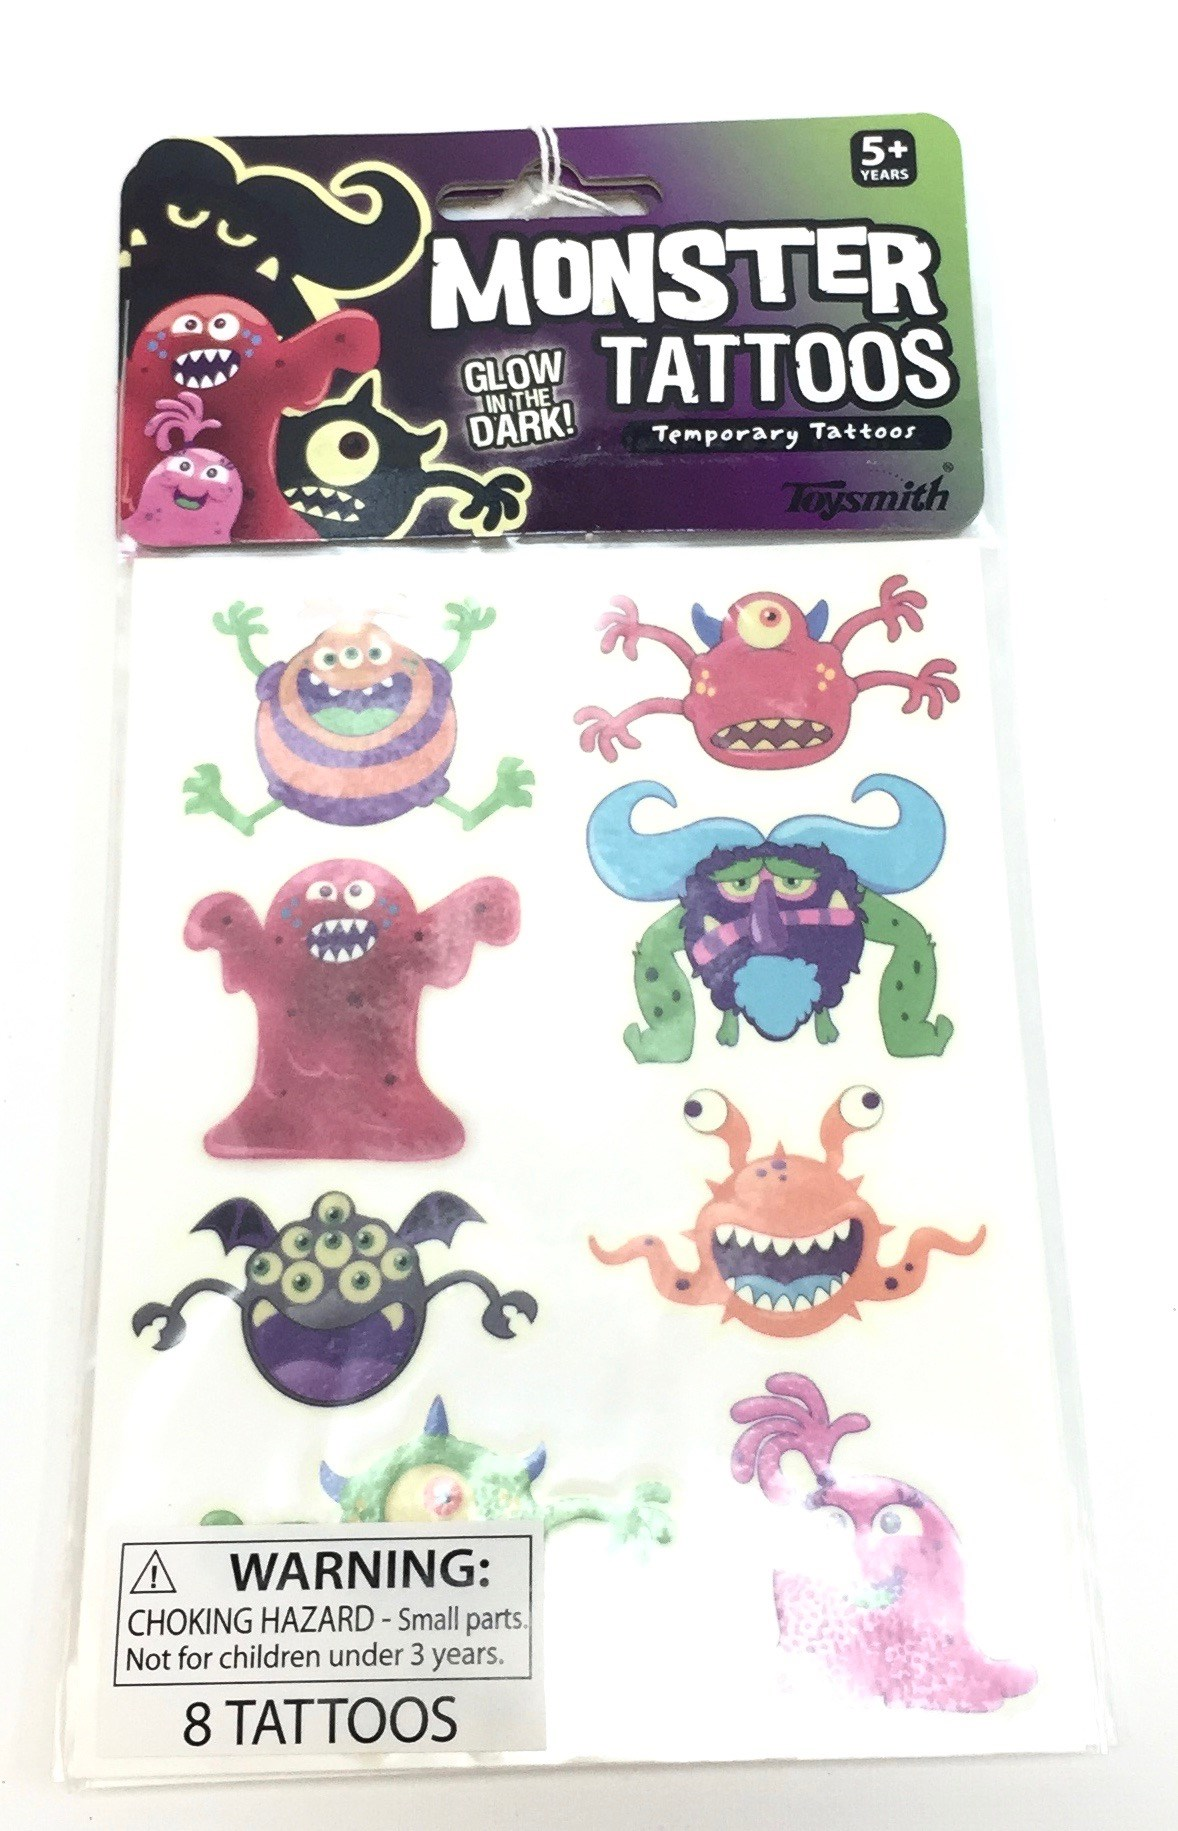 Glow Monster Tattoos